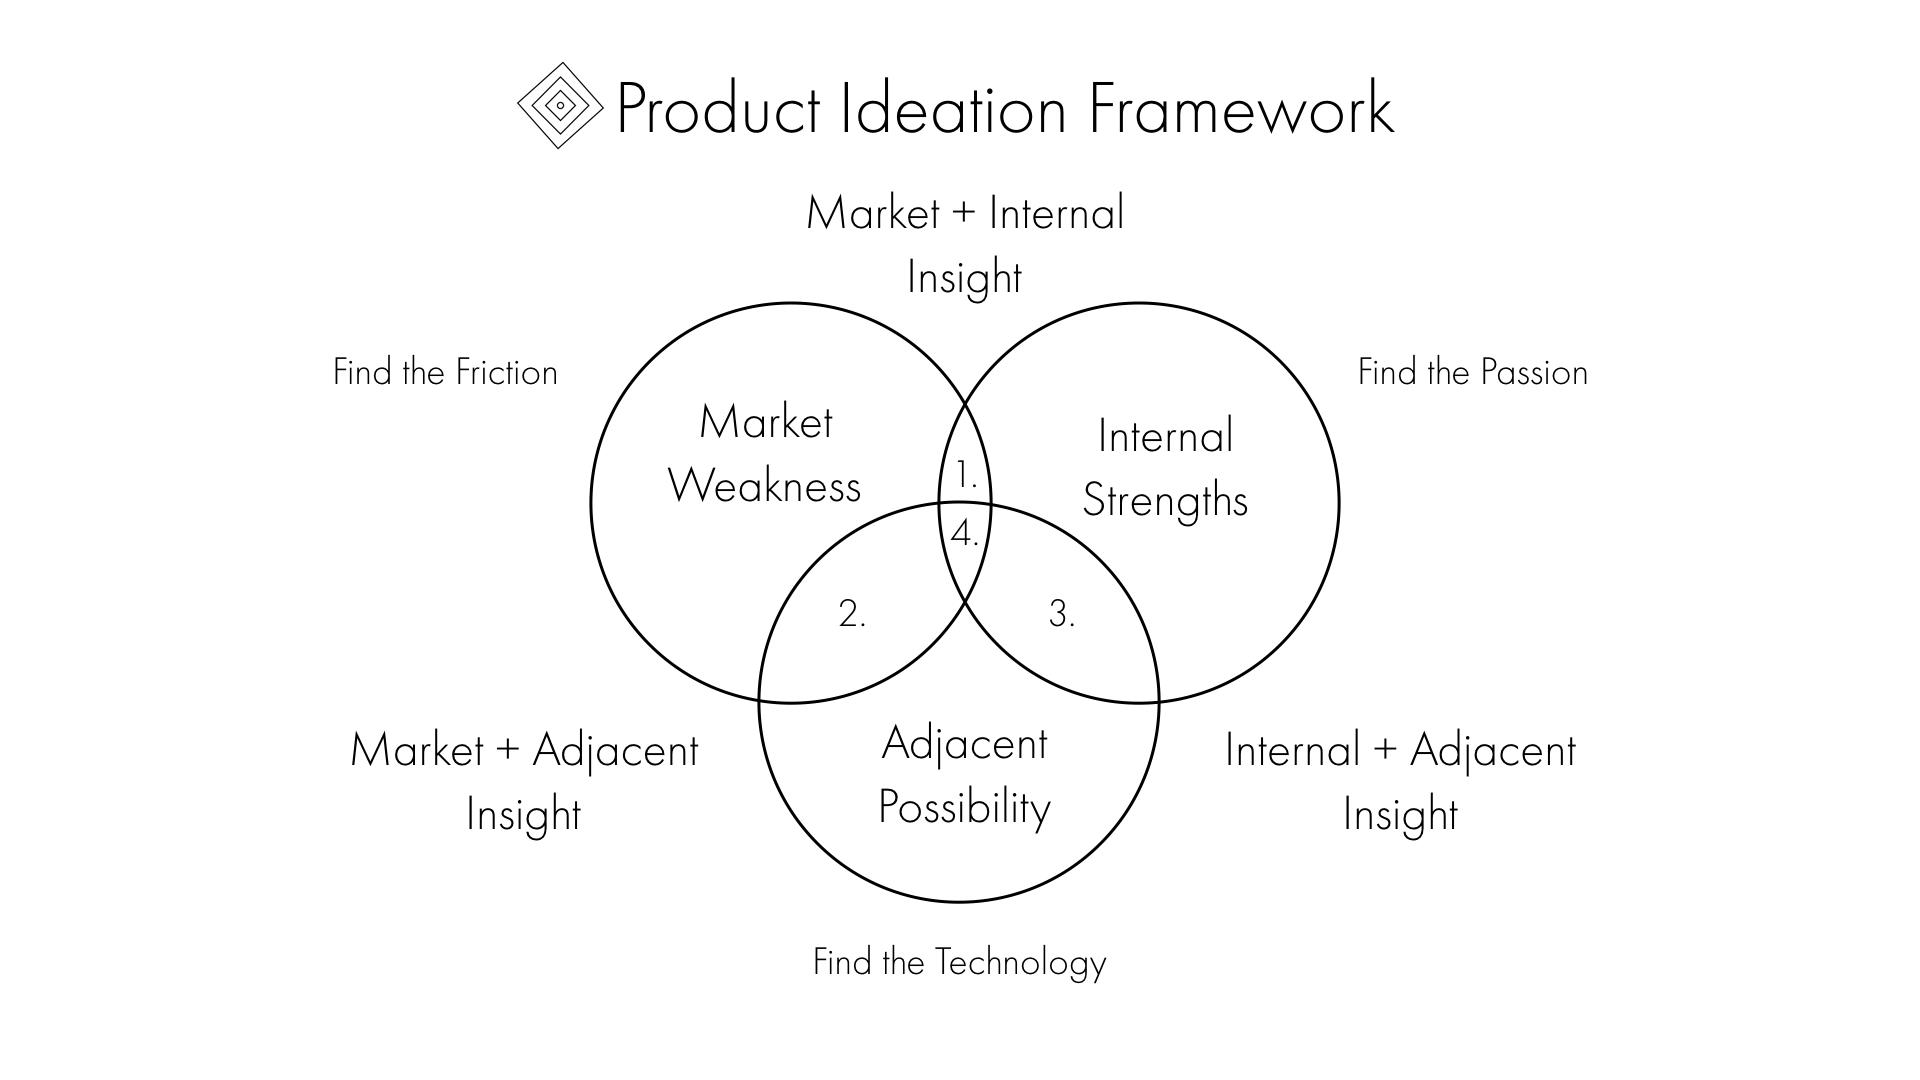 Product Ideation Framework